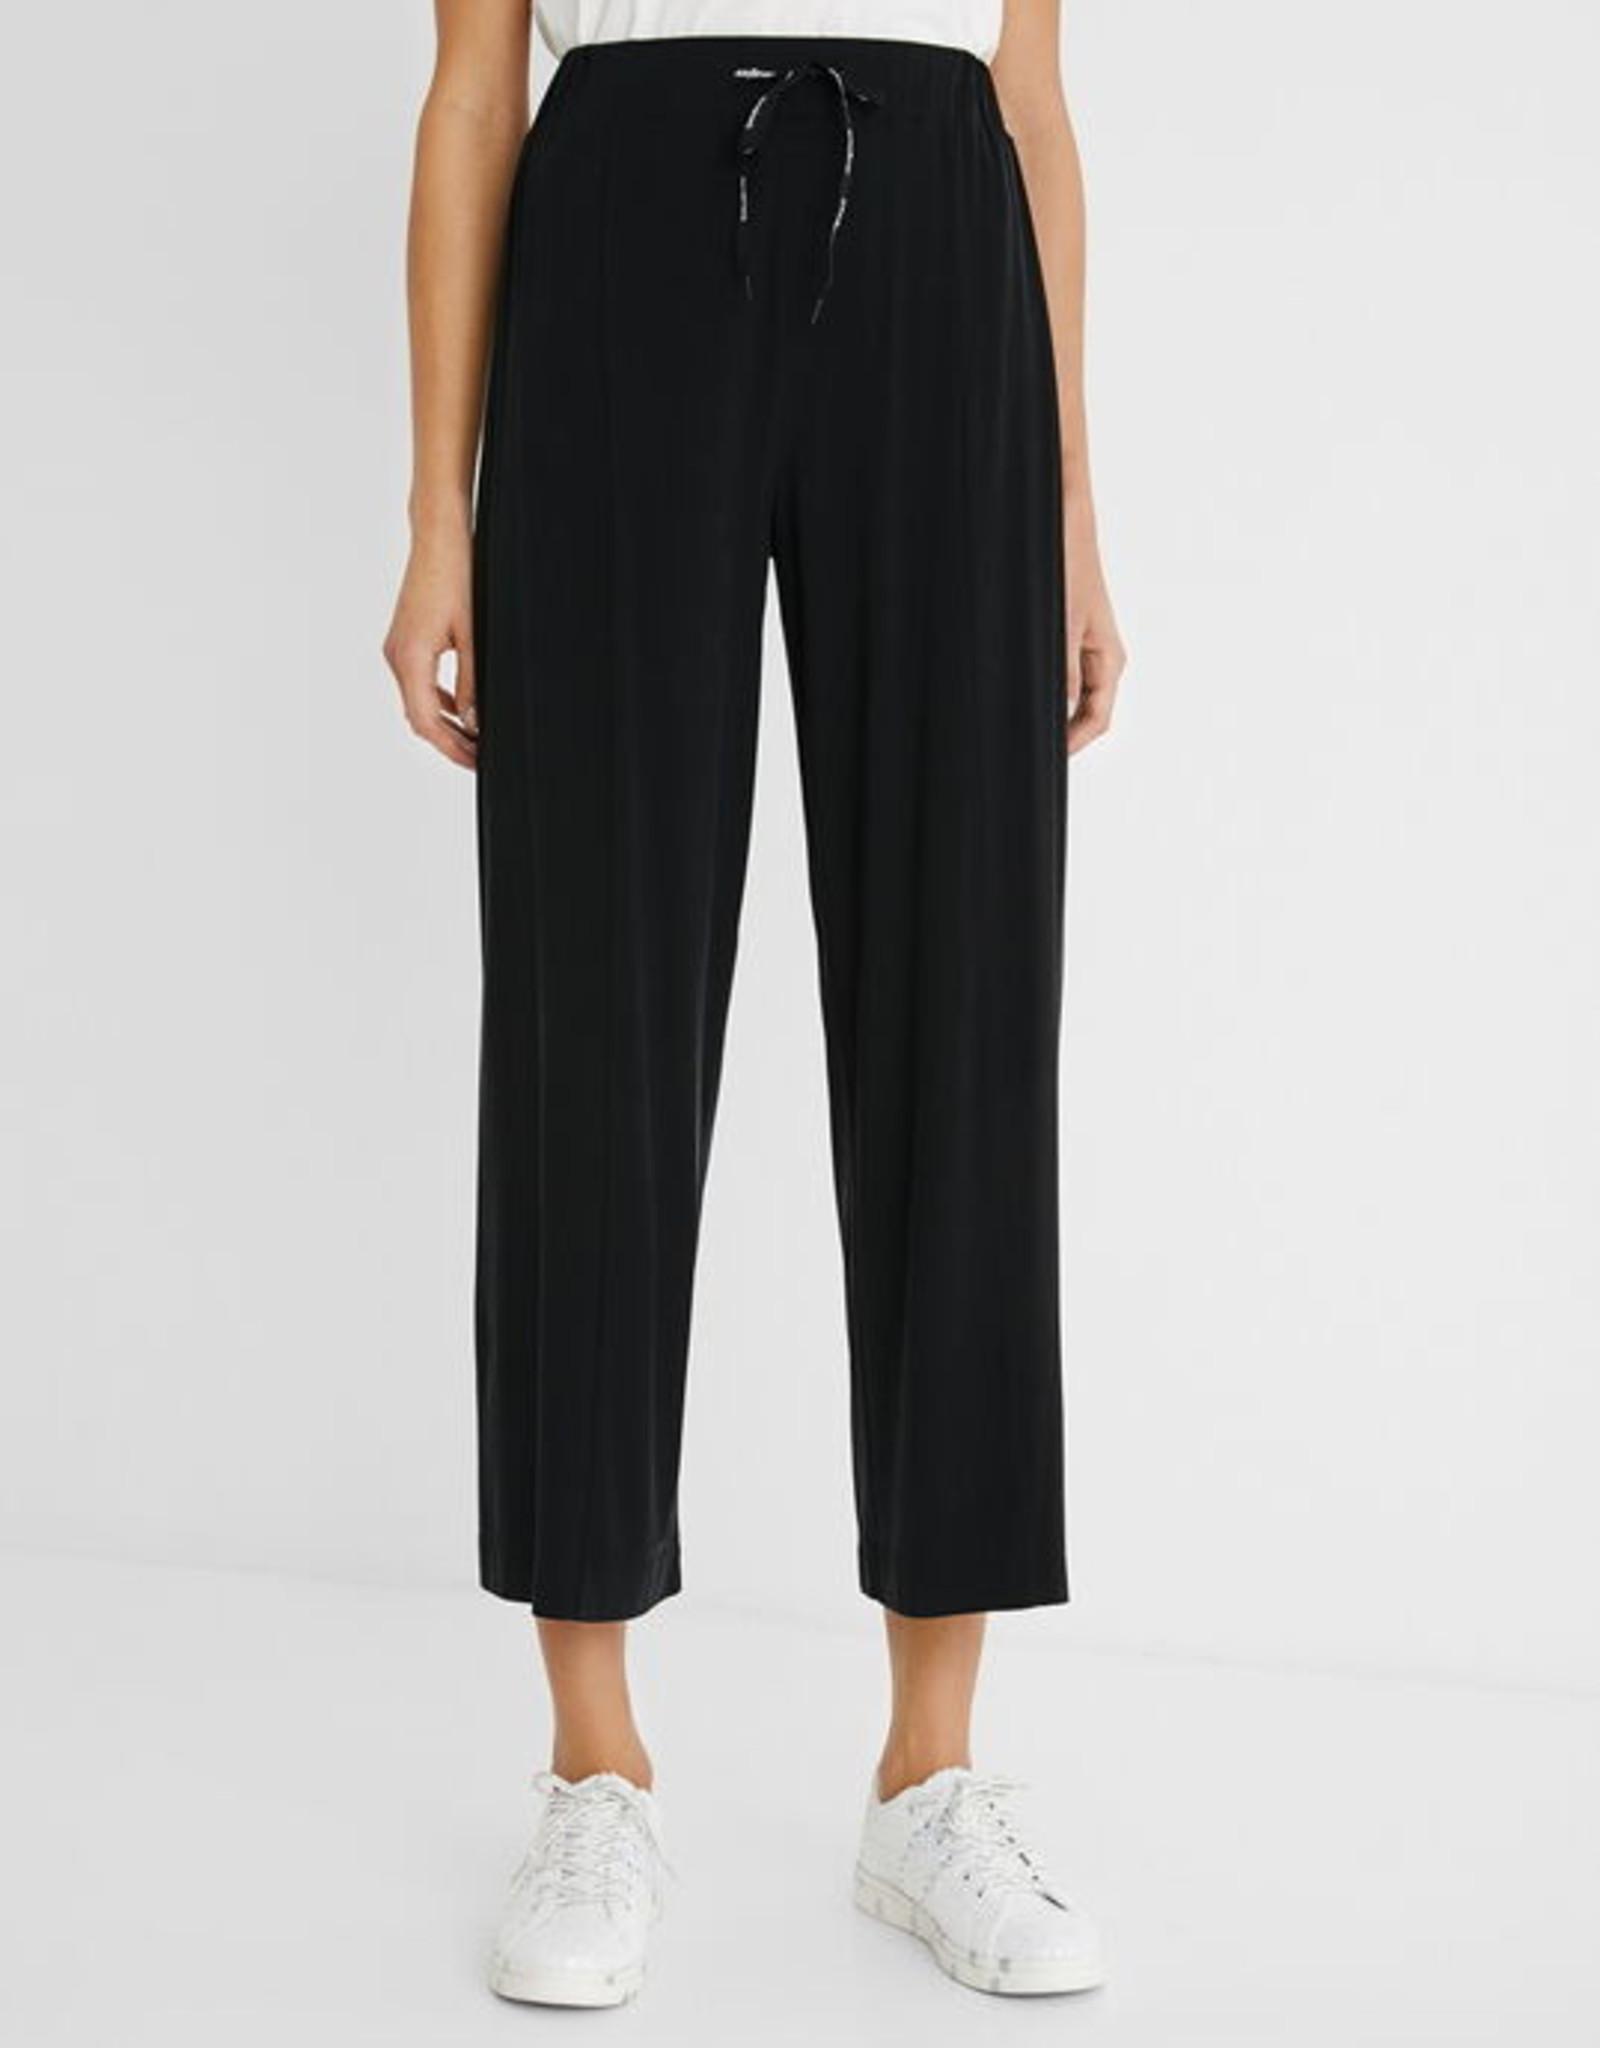 Desigual Flowing Drawstring Trousers